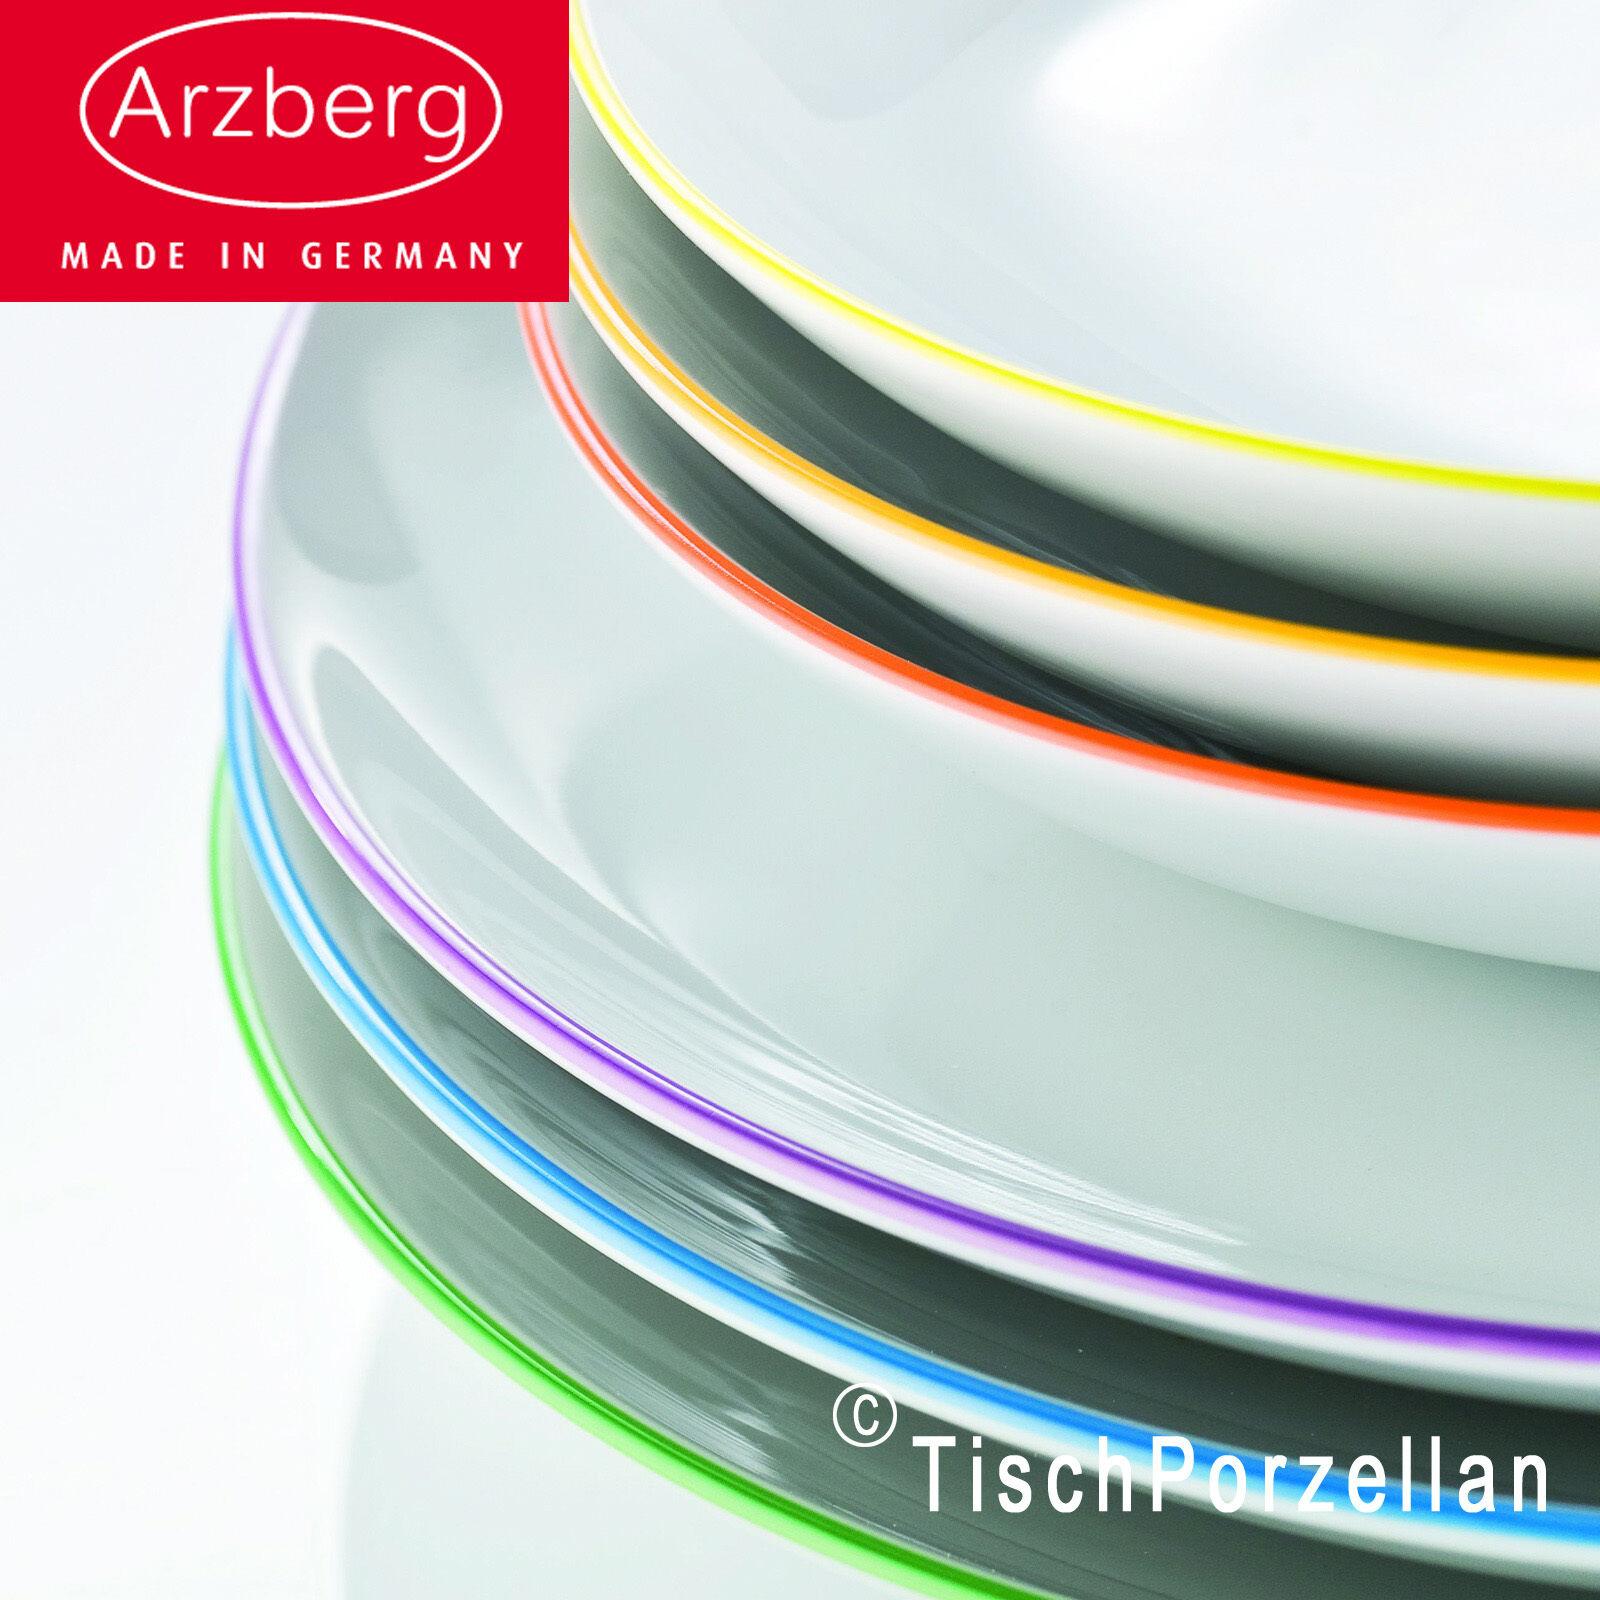 1x arzberg porzellan cucina colori green gr n suppenteller. Black Bedroom Furniture Sets. Home Design Ideas